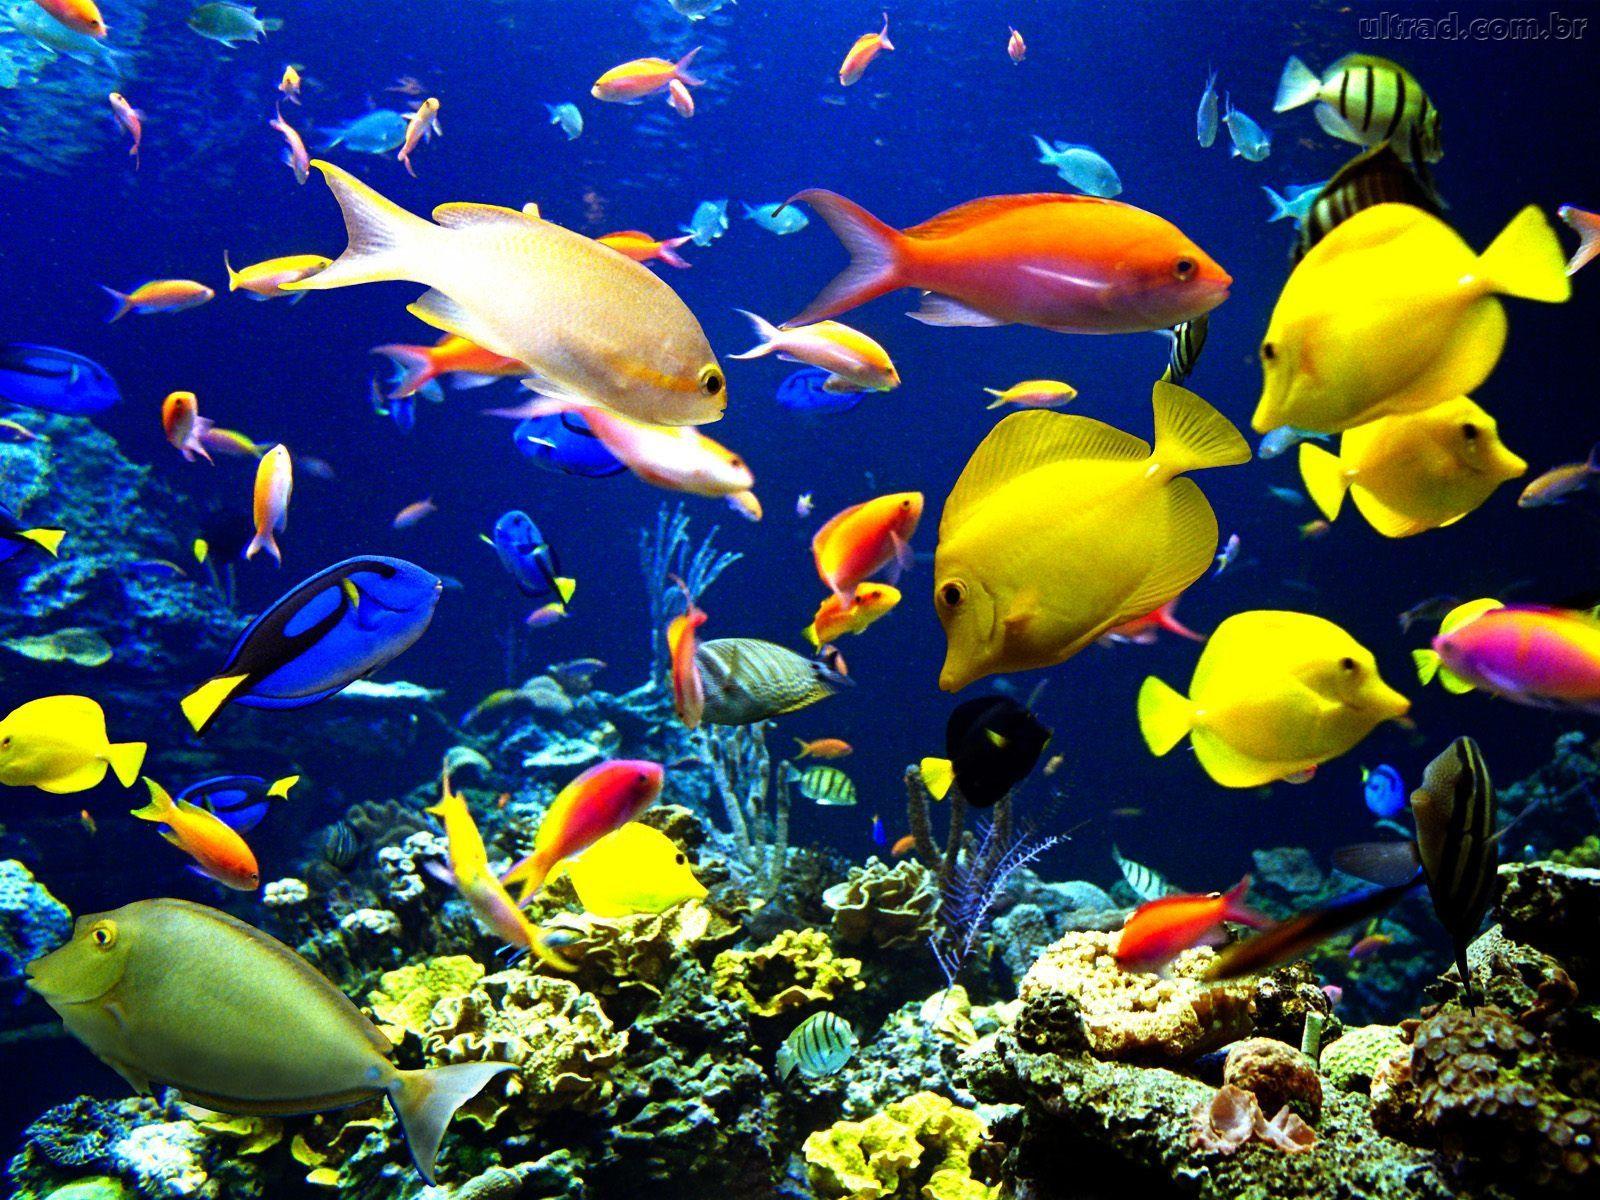 http://2.bp.blogspot.com/-jZMNUtmrTlc/T5gfDNESoGI/AAAAAAAAARg/V9gfACWzACg/s1600/peixes.jpg